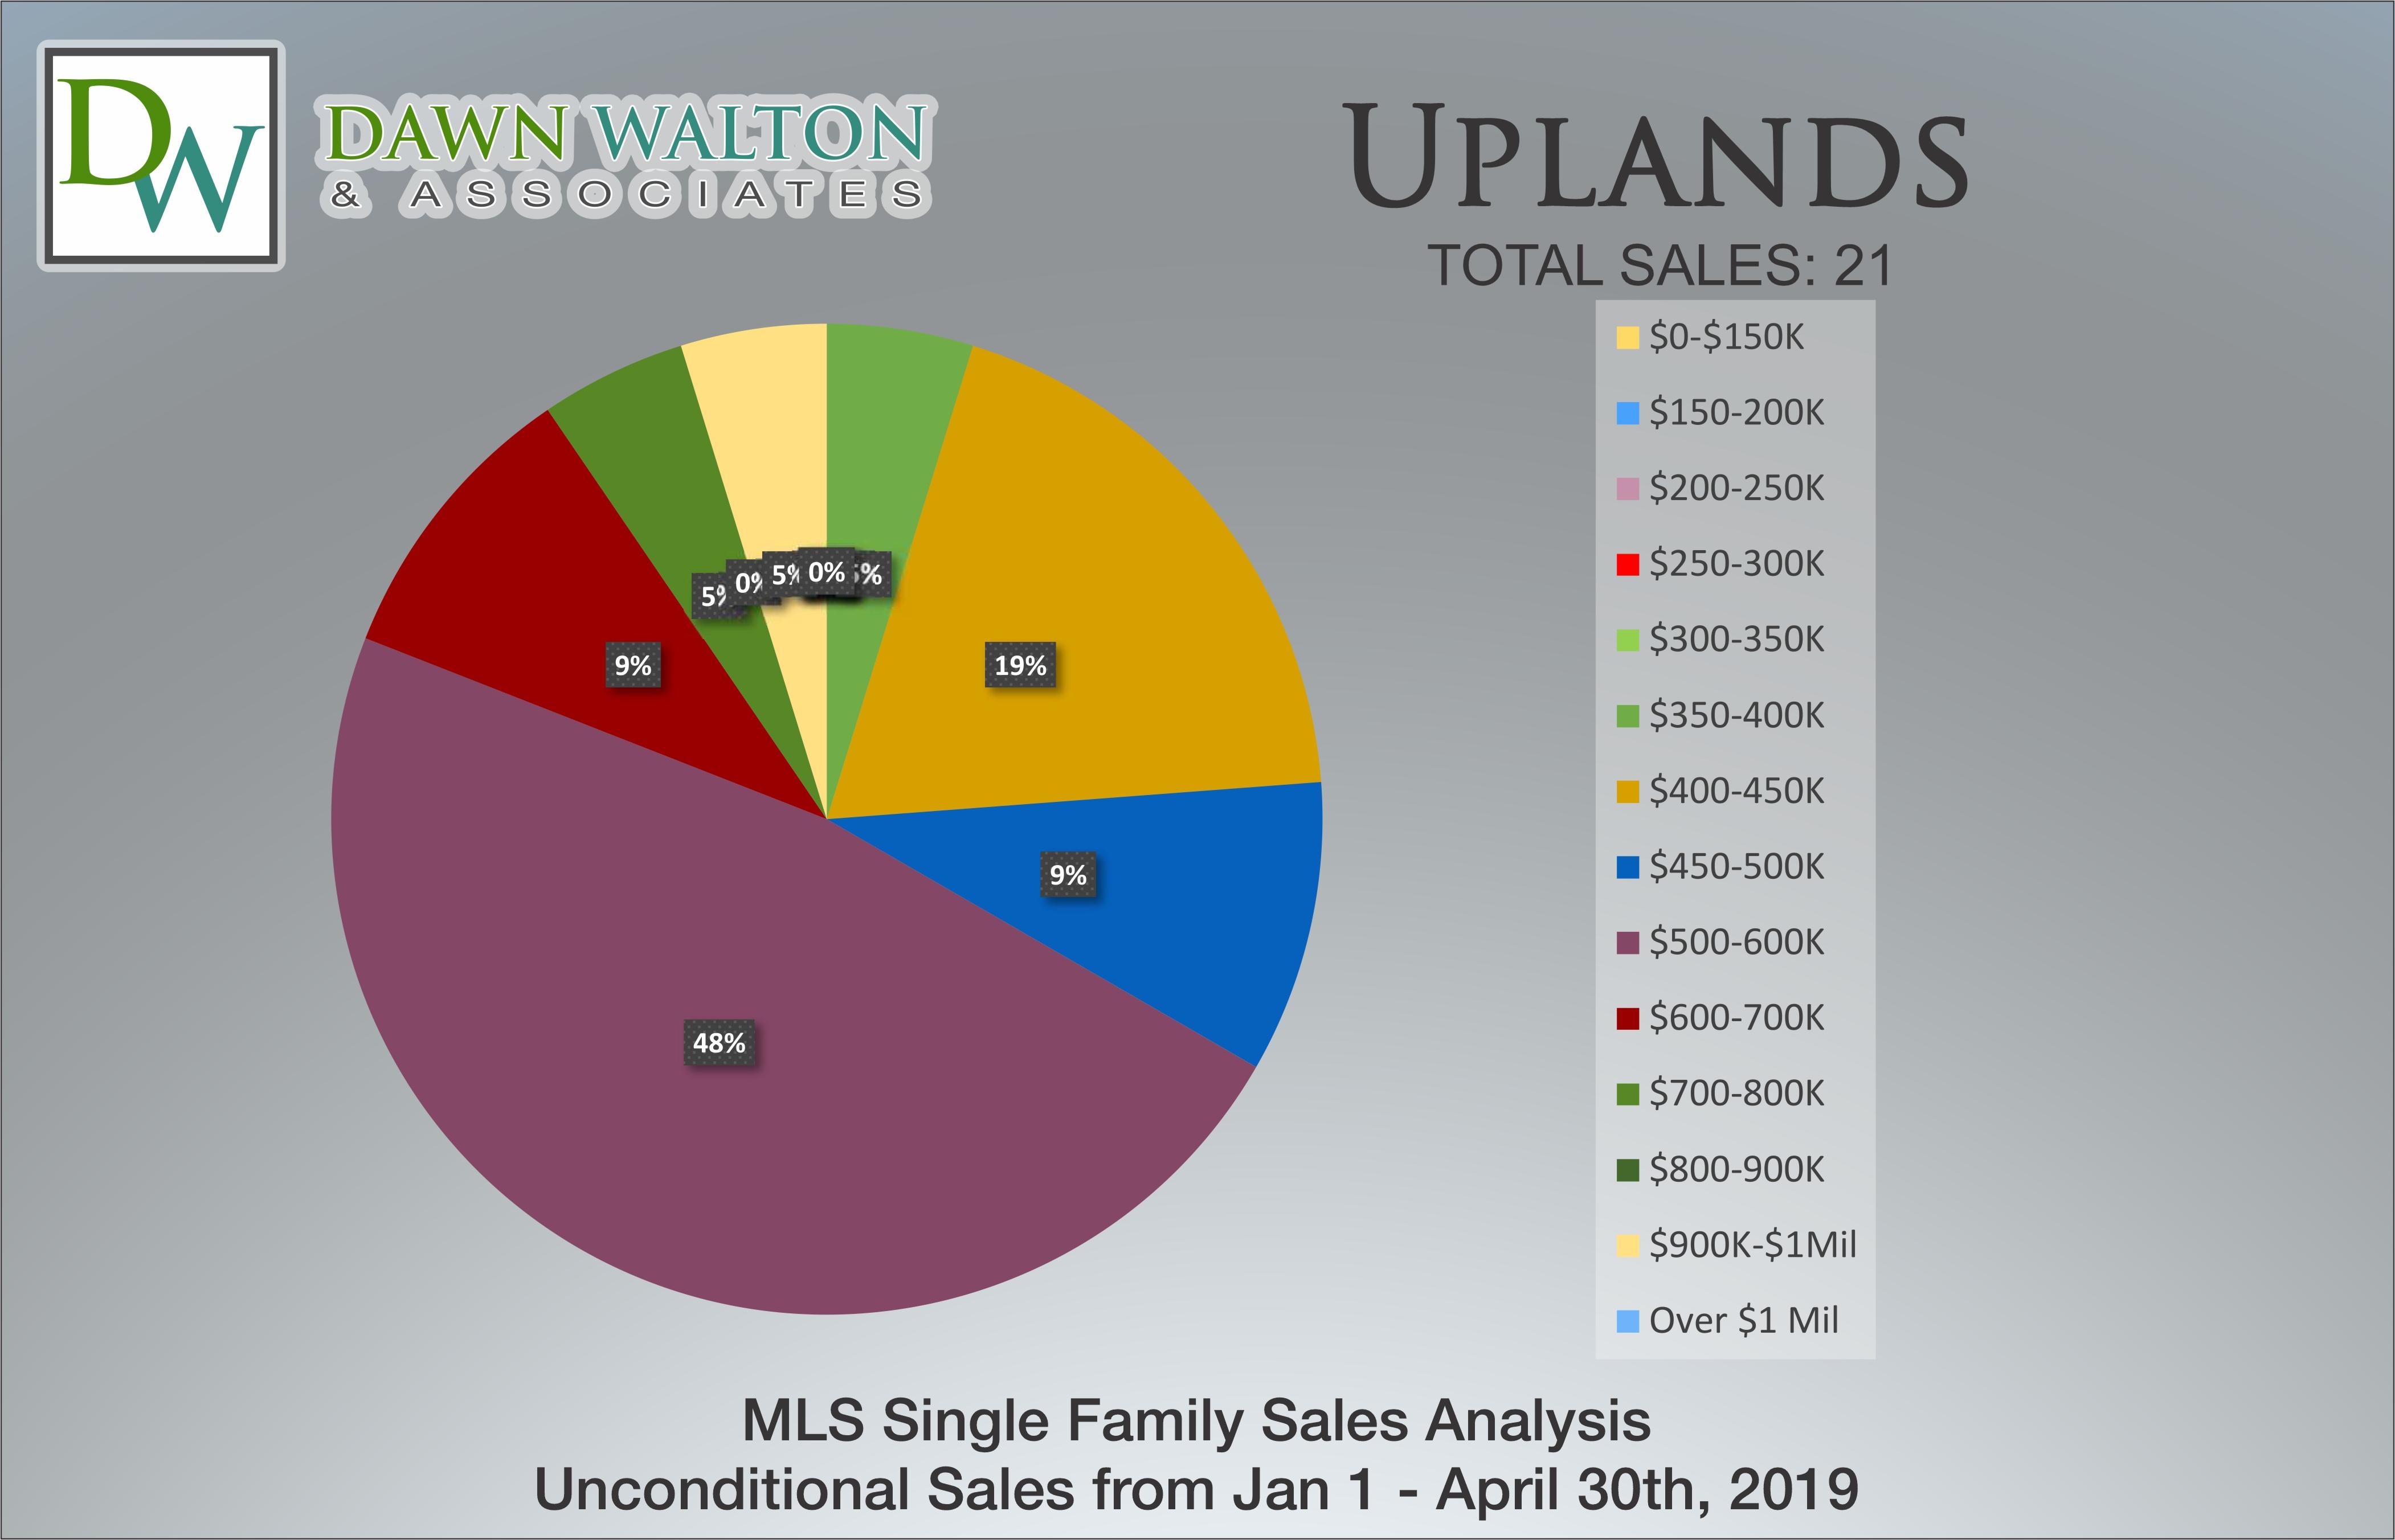 Uplands Real Estate Market Stats Price Percentage Jan 1 - April 30, 2019 - Nanaimo Realtor Dawn Walton